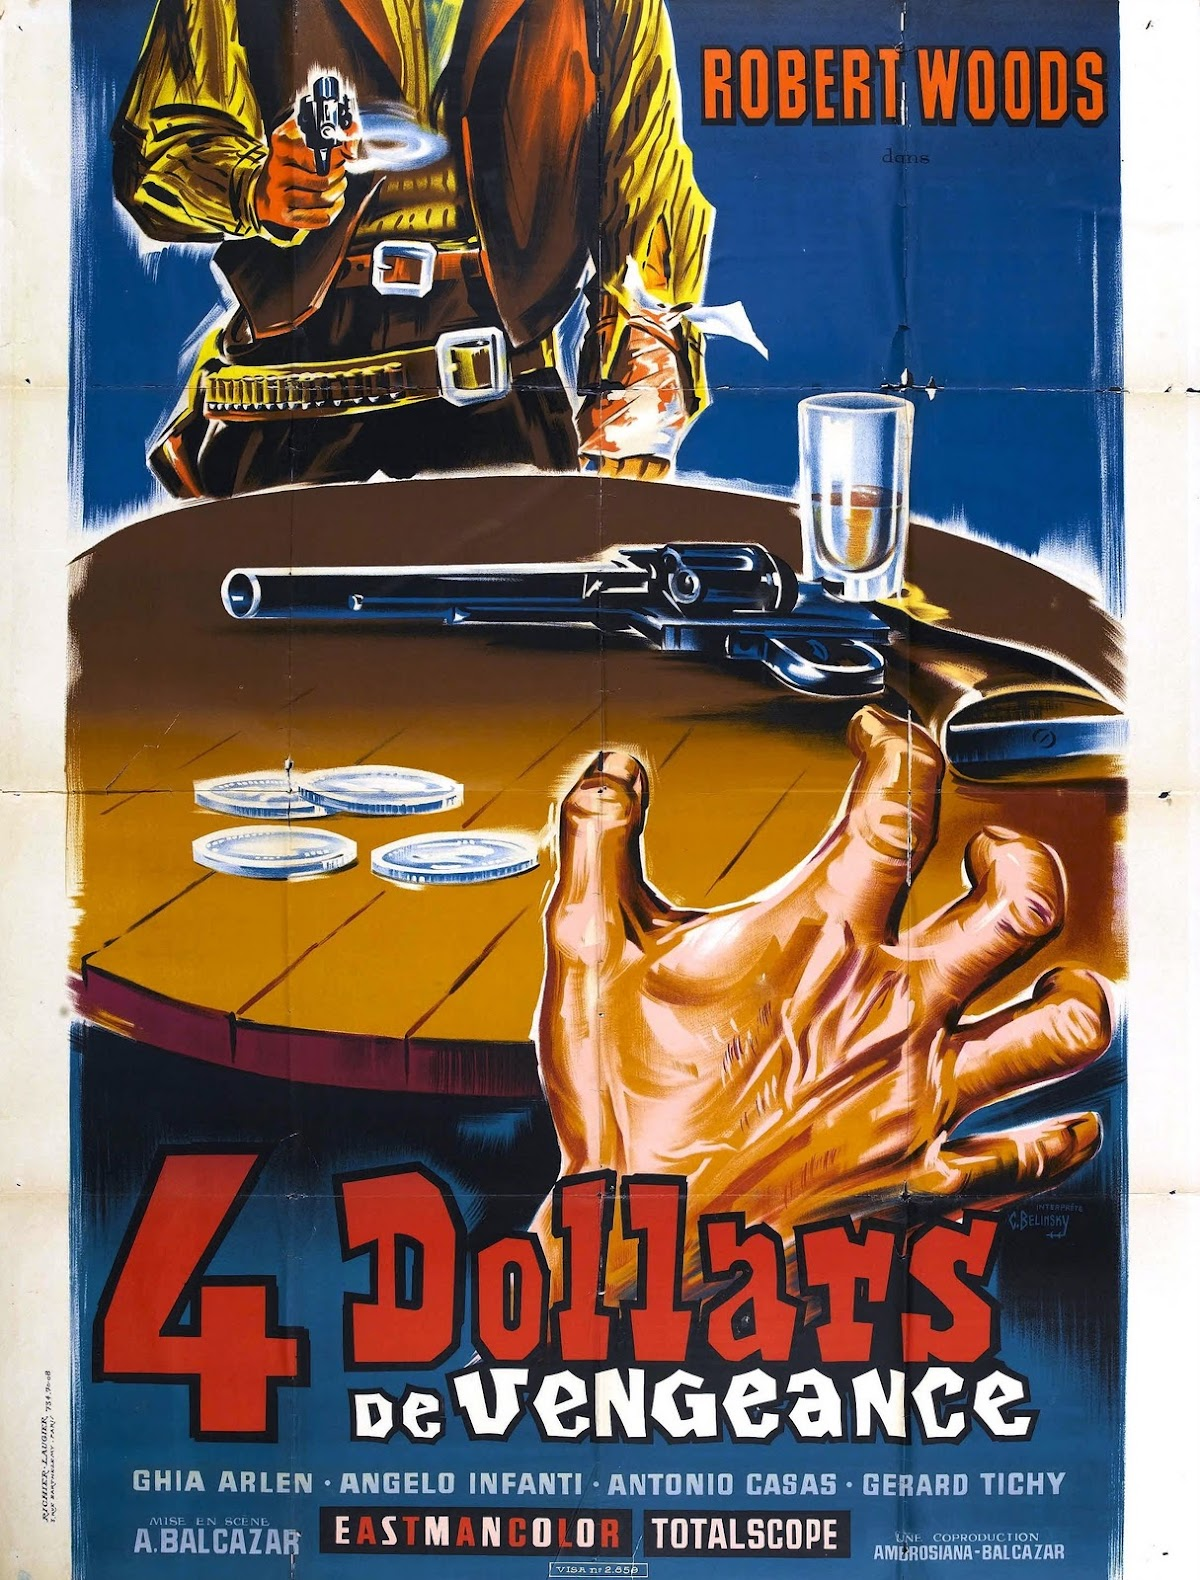 http://4.bp.blogspot.com/-CROrBcVy7oE/TVhFFjpHxXI/AAAAAAAAIi8/HYqscwYDmQY/s1580/four_dollars_for_vengeance_poster_01.jpg